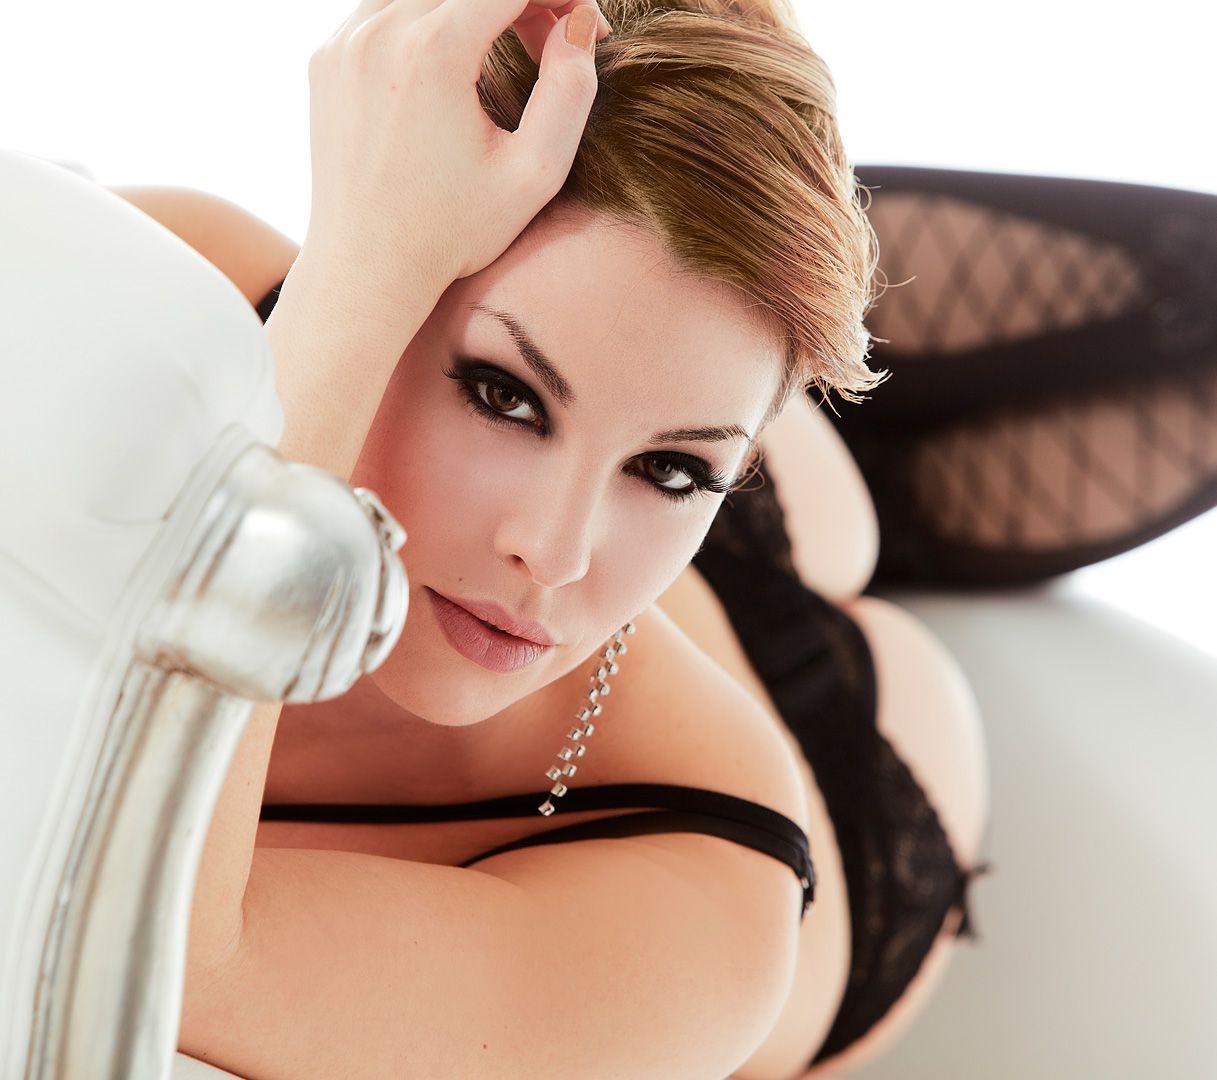 fotos boudoir budoir lenceria retrato femenino fotografia íntima sensual estudio Leganés Madrid intimisimi blonde scort Sandra 204 jpg